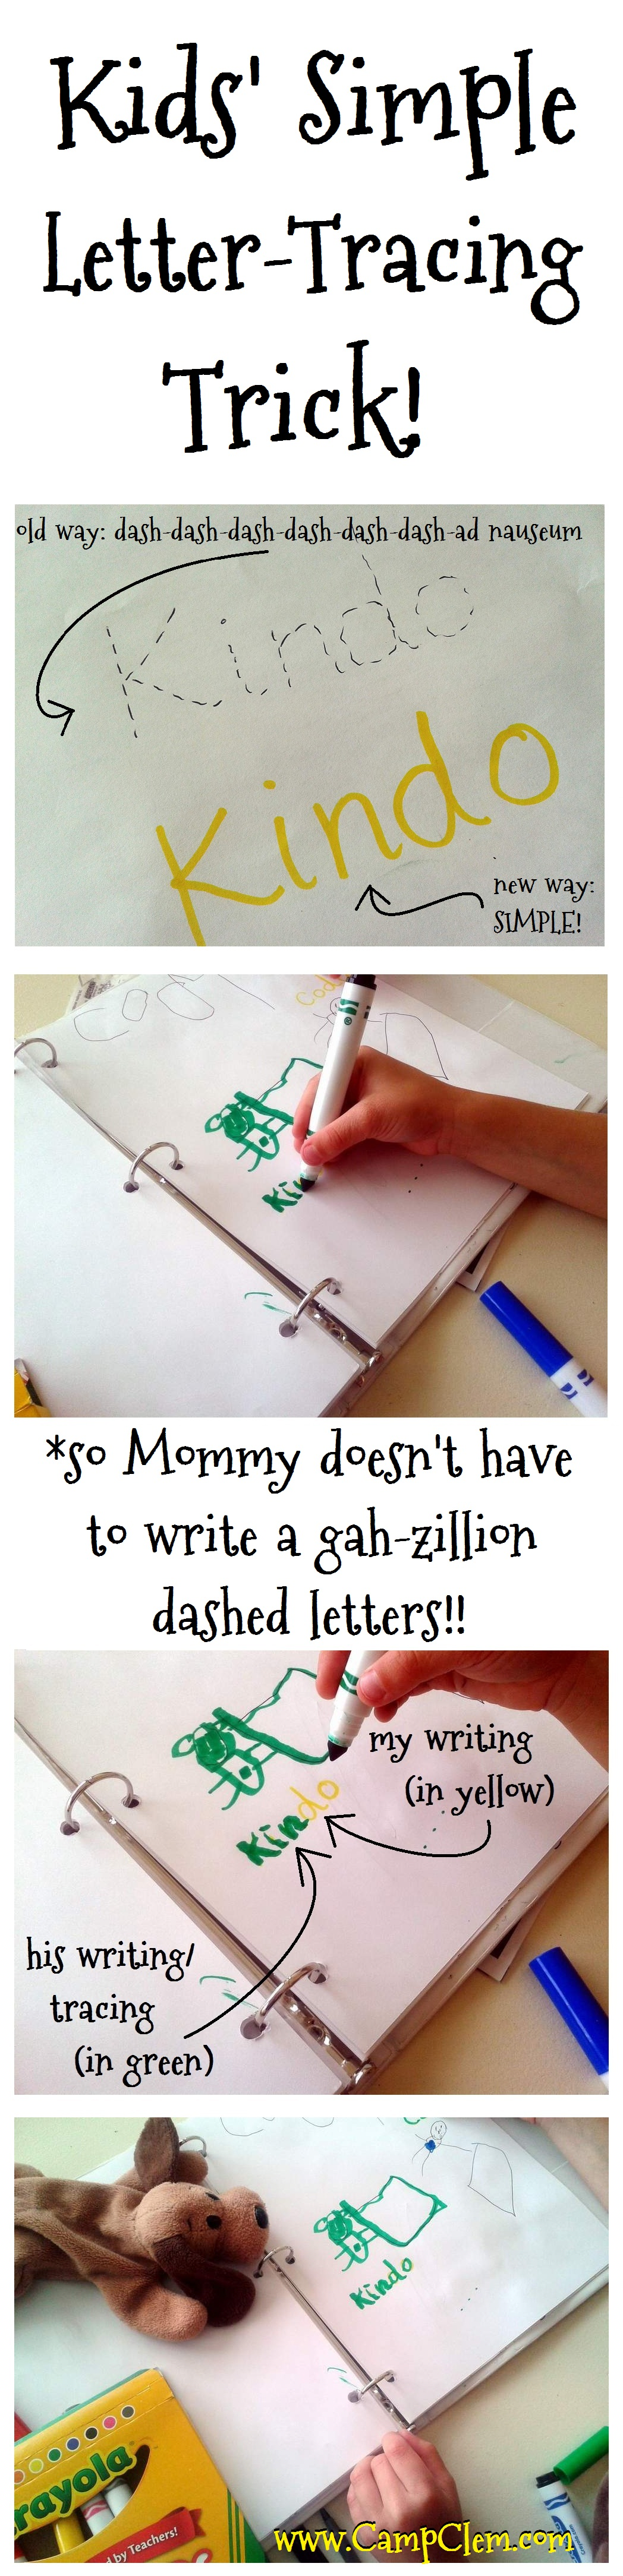 a simple trick for kids letter tracing campclem. Black Bedroom Furniture Sets. Home Design Ideas